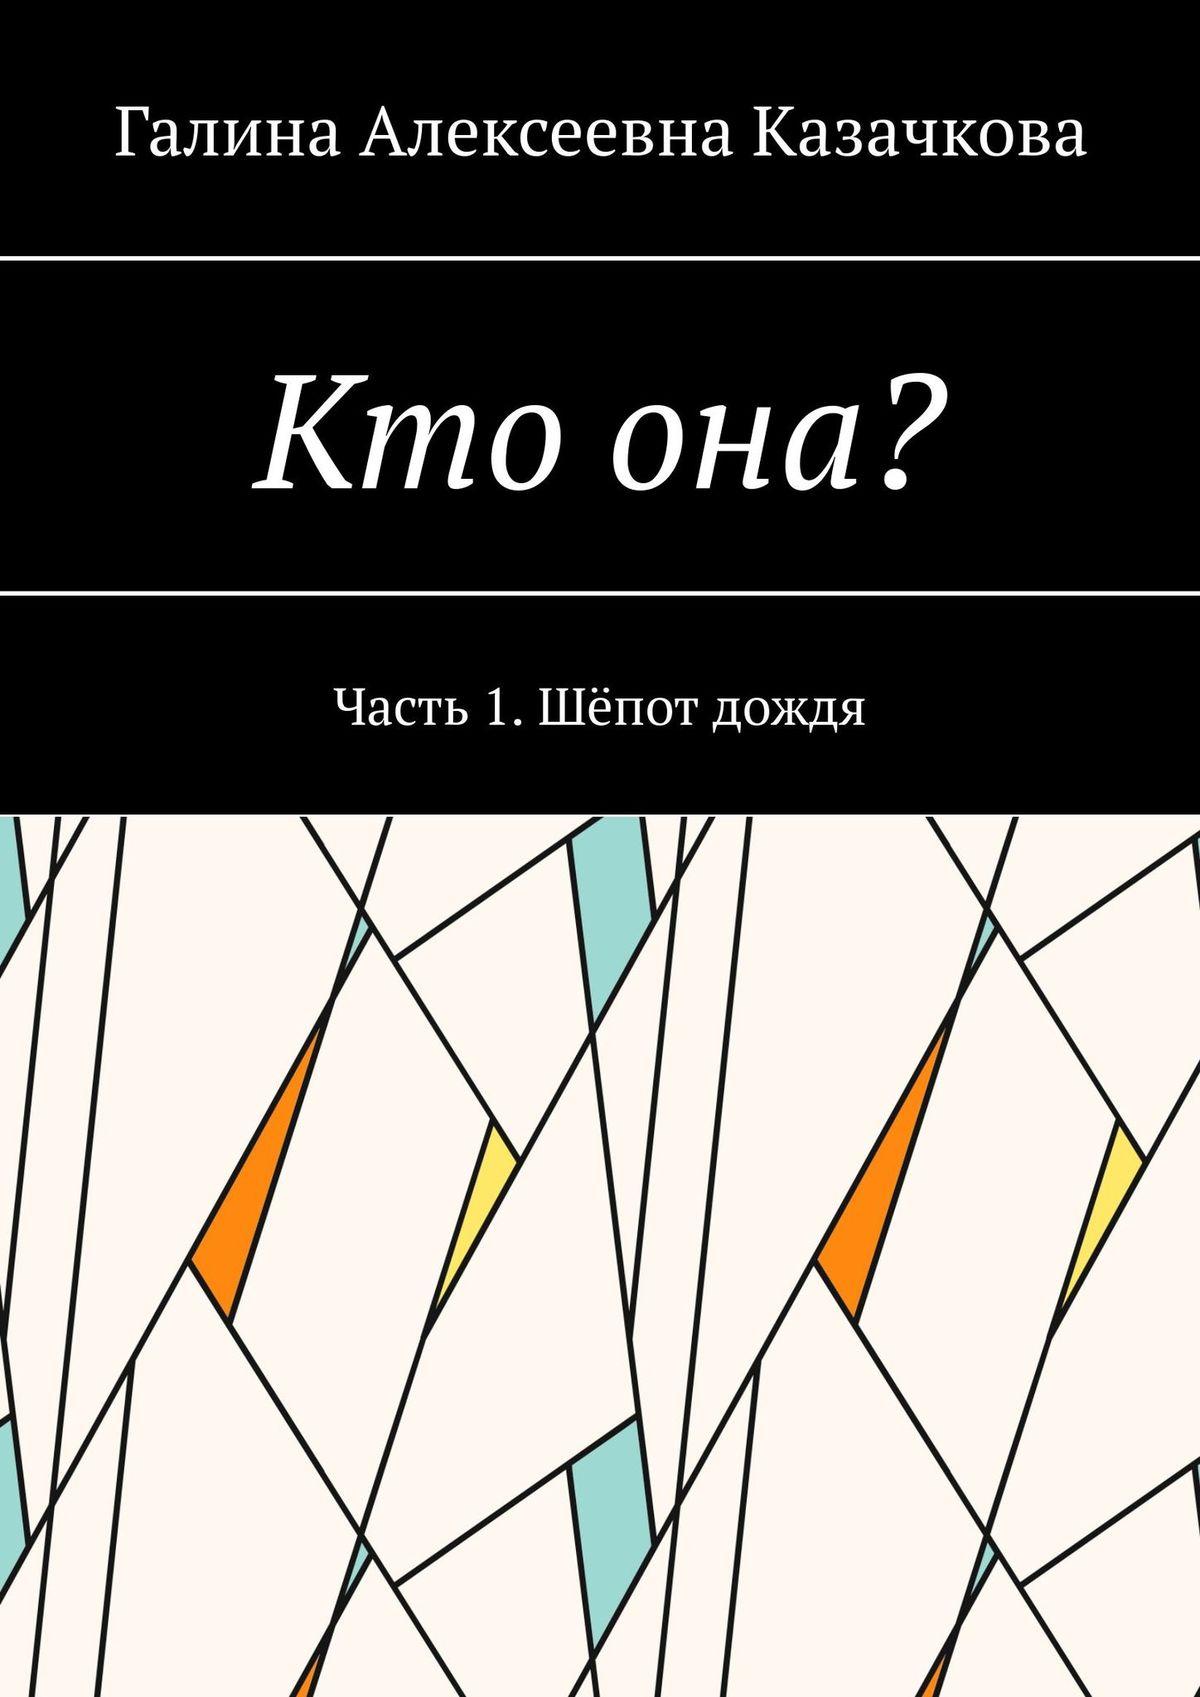 Галина Казачкова Ктоона? Часть 1. Шёпот дождя